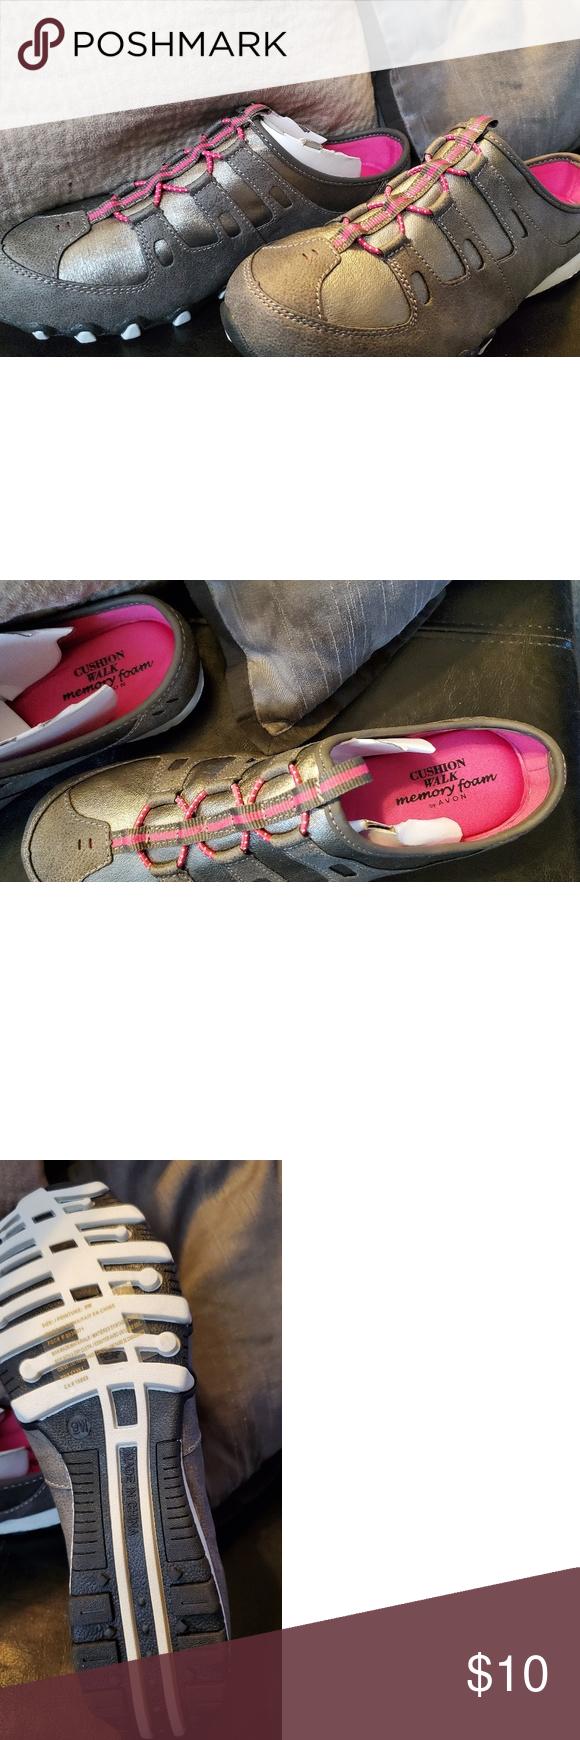 cushion walk memory foam cipő factory